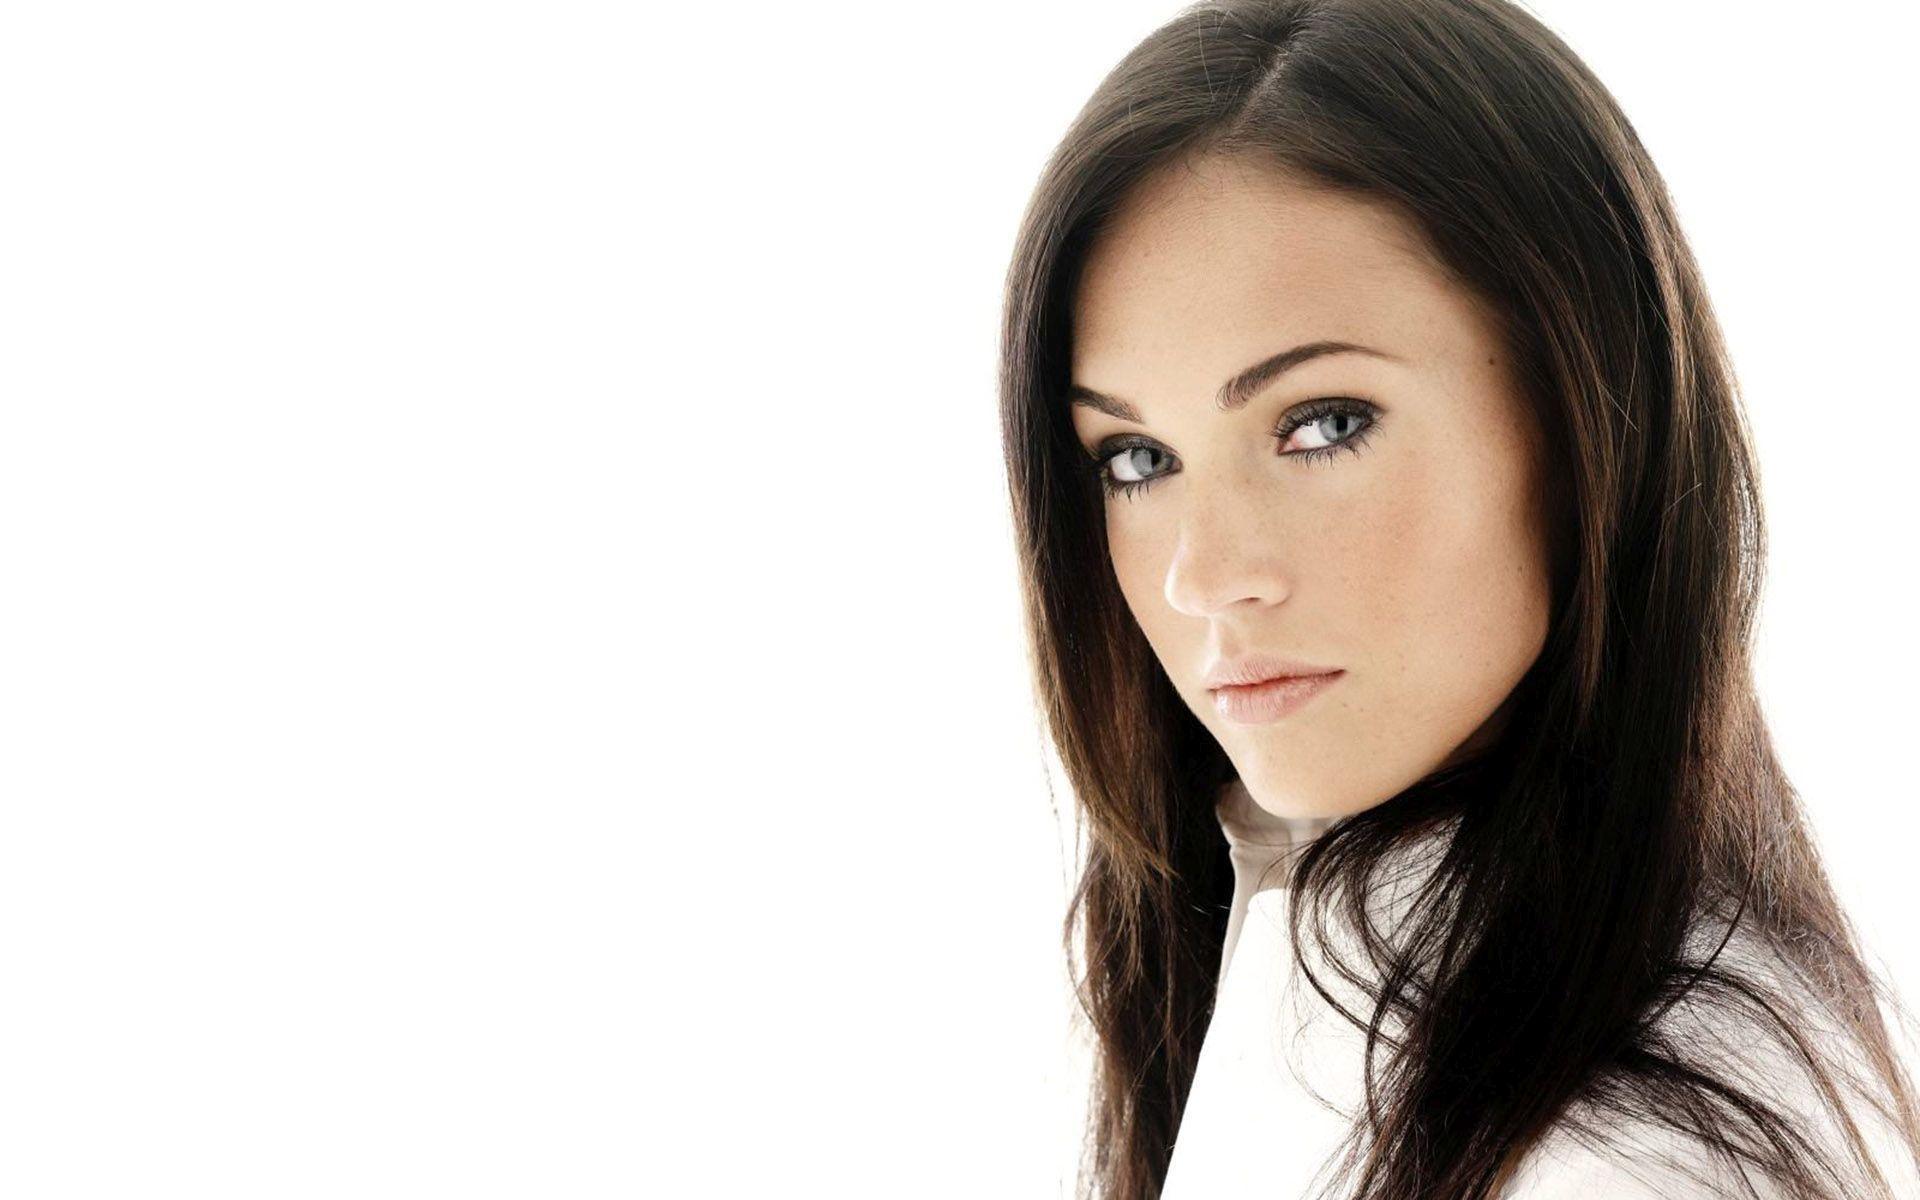 Transformers Wallpaper Hd Widescreen Megan Fox Young Www Pixshark Com Images Galleries With